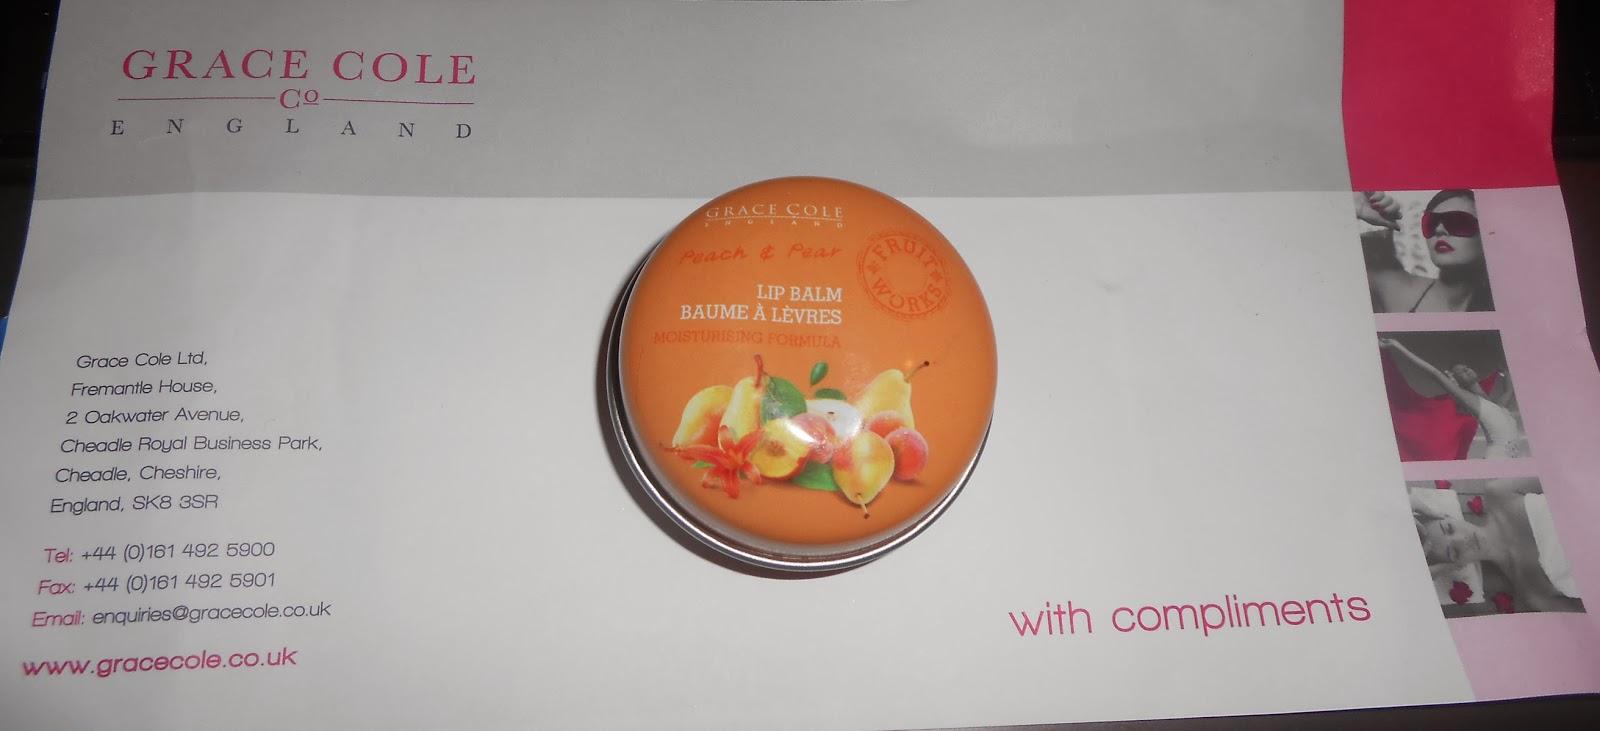 Peach_and_pear_grace_cole_lip_balm